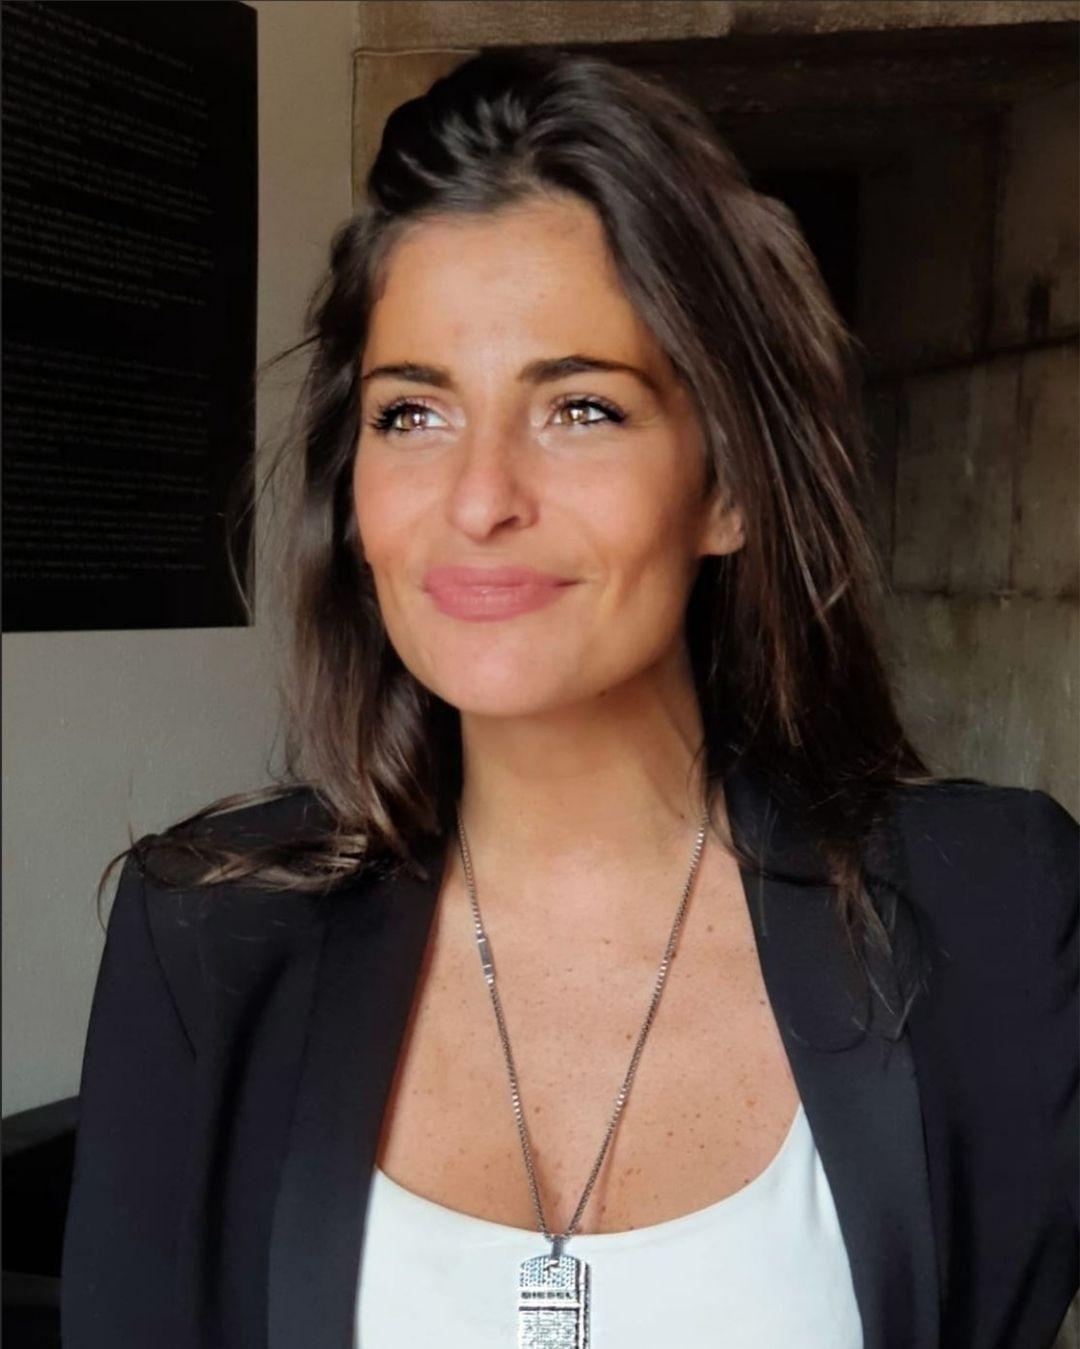 Mariana Cabugueira, Zaha Hadid Architects, Fluidity, Maya Instructor, Architecture and Fluid Design